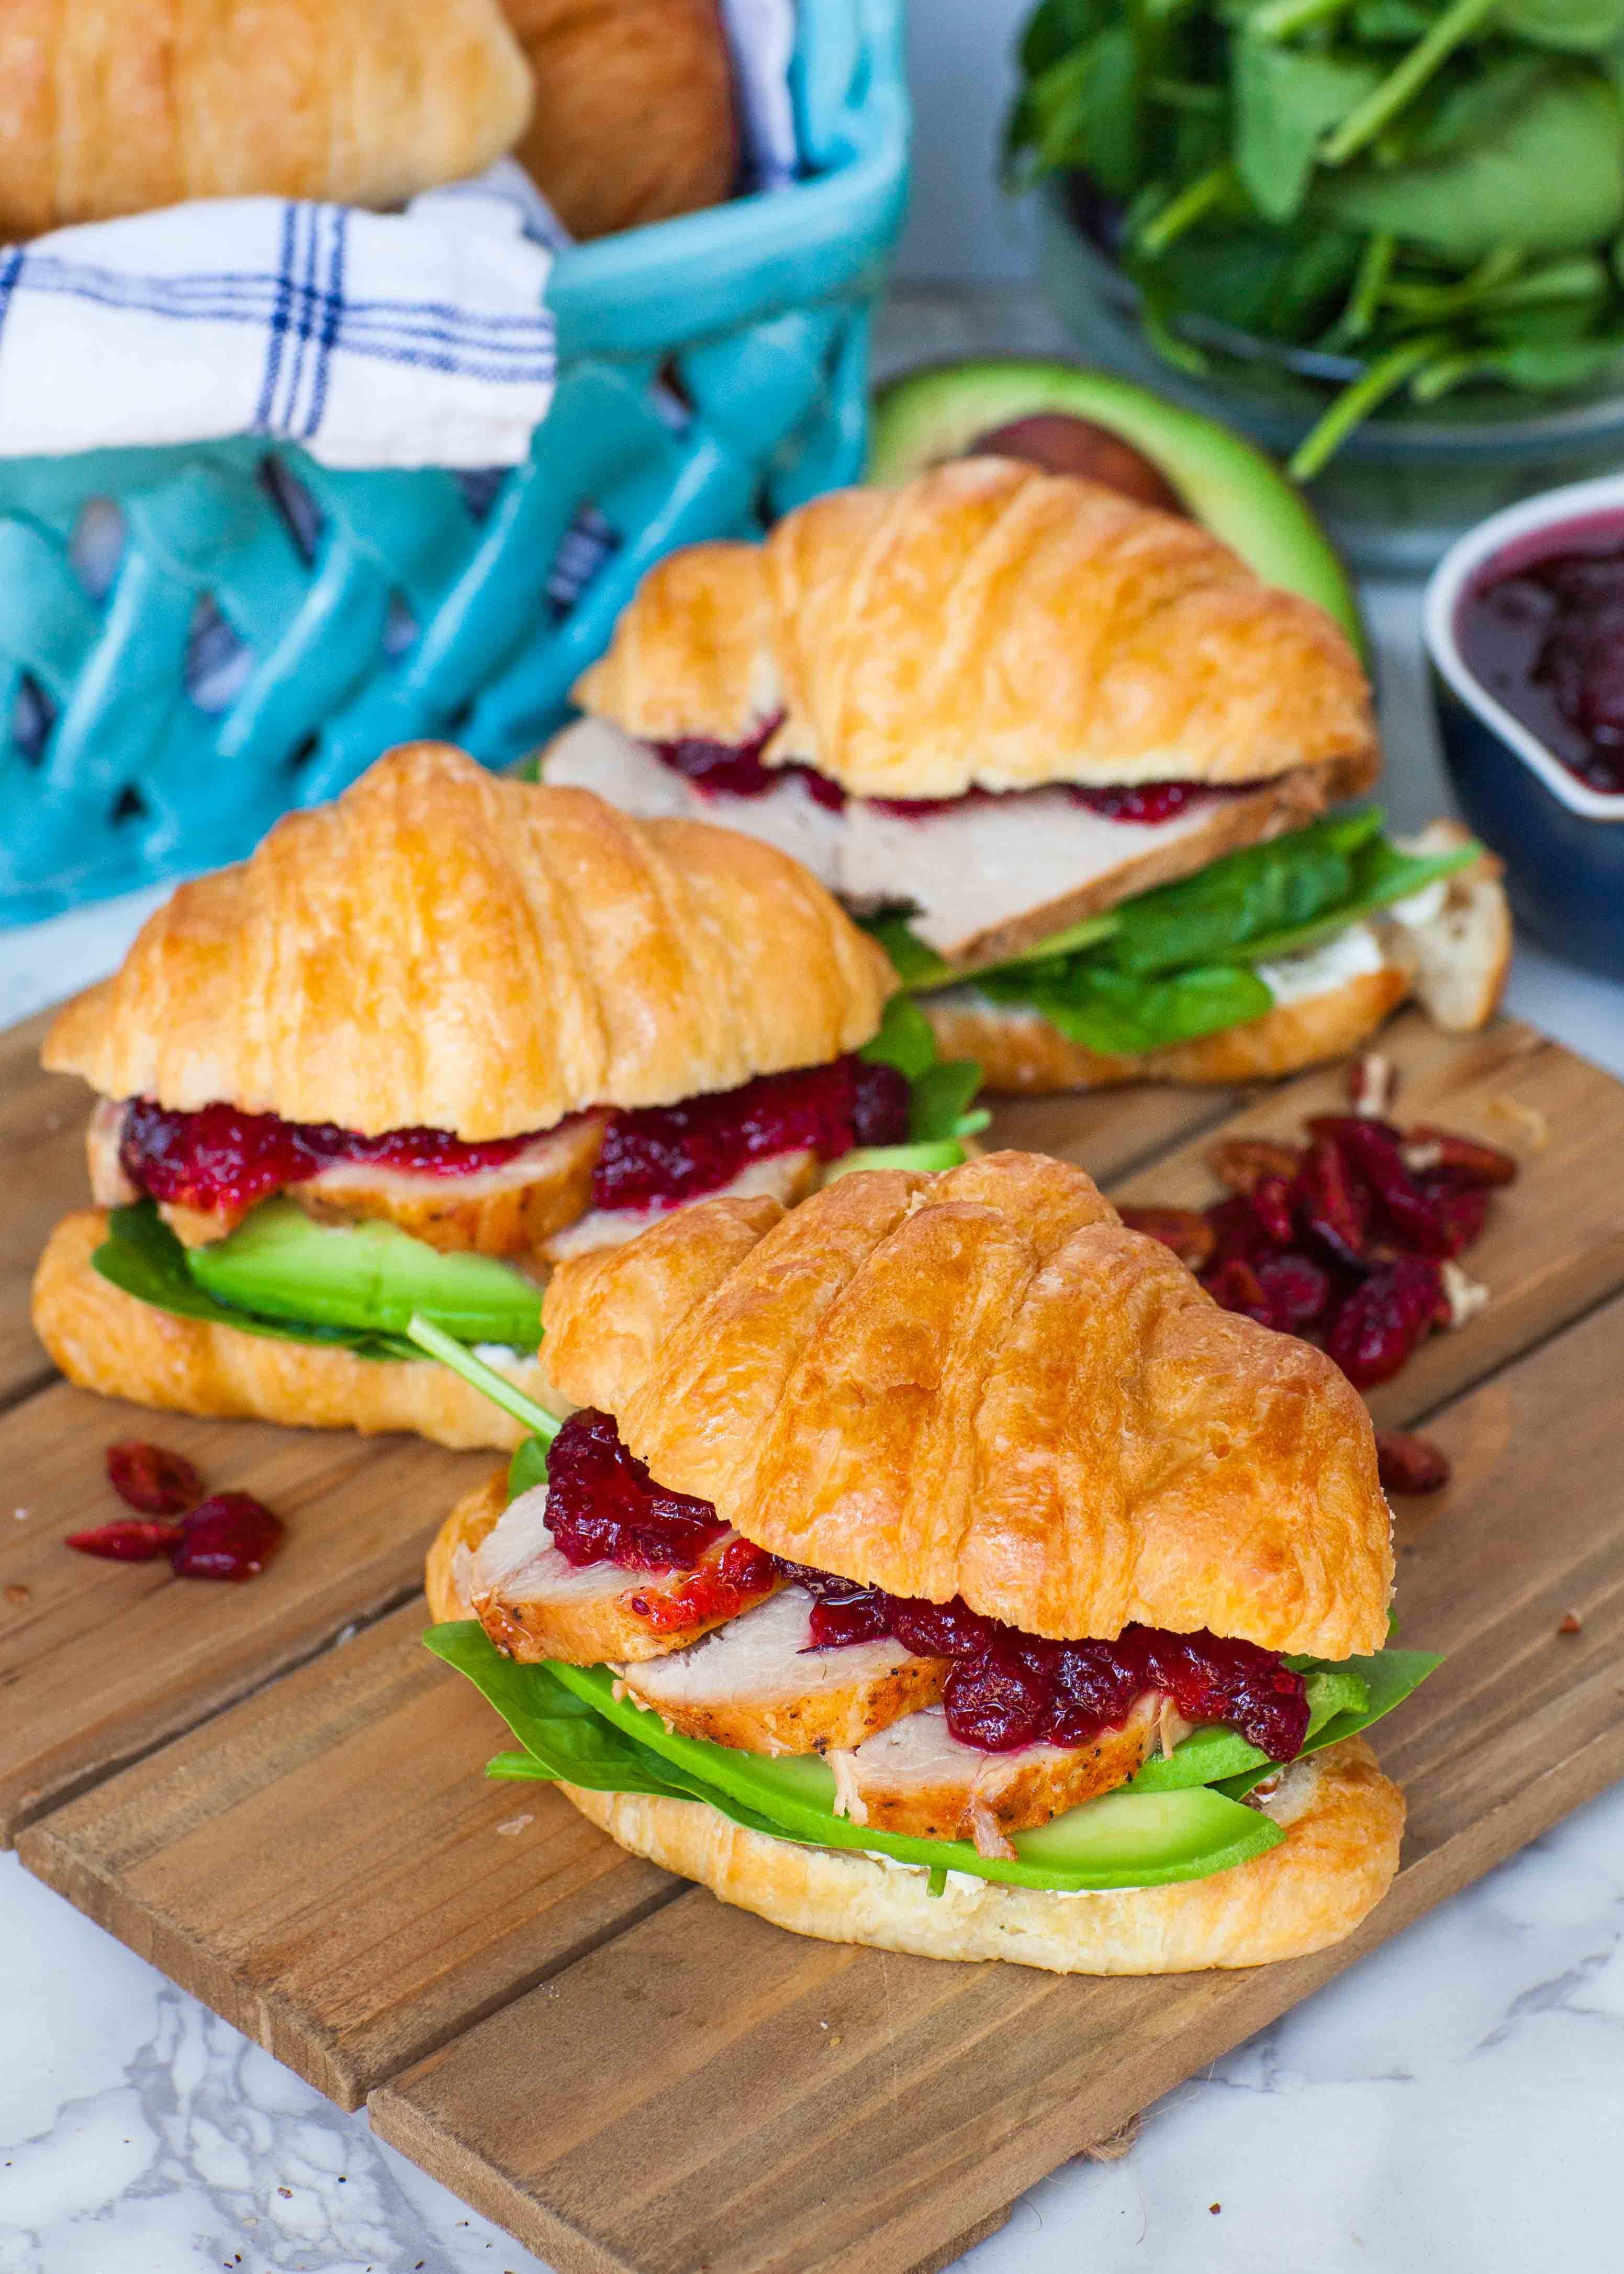 Roasted Pork Amp Cranberry Sandwich Recipe Food Recipes Tatyana S Everyday Food Sandwiches